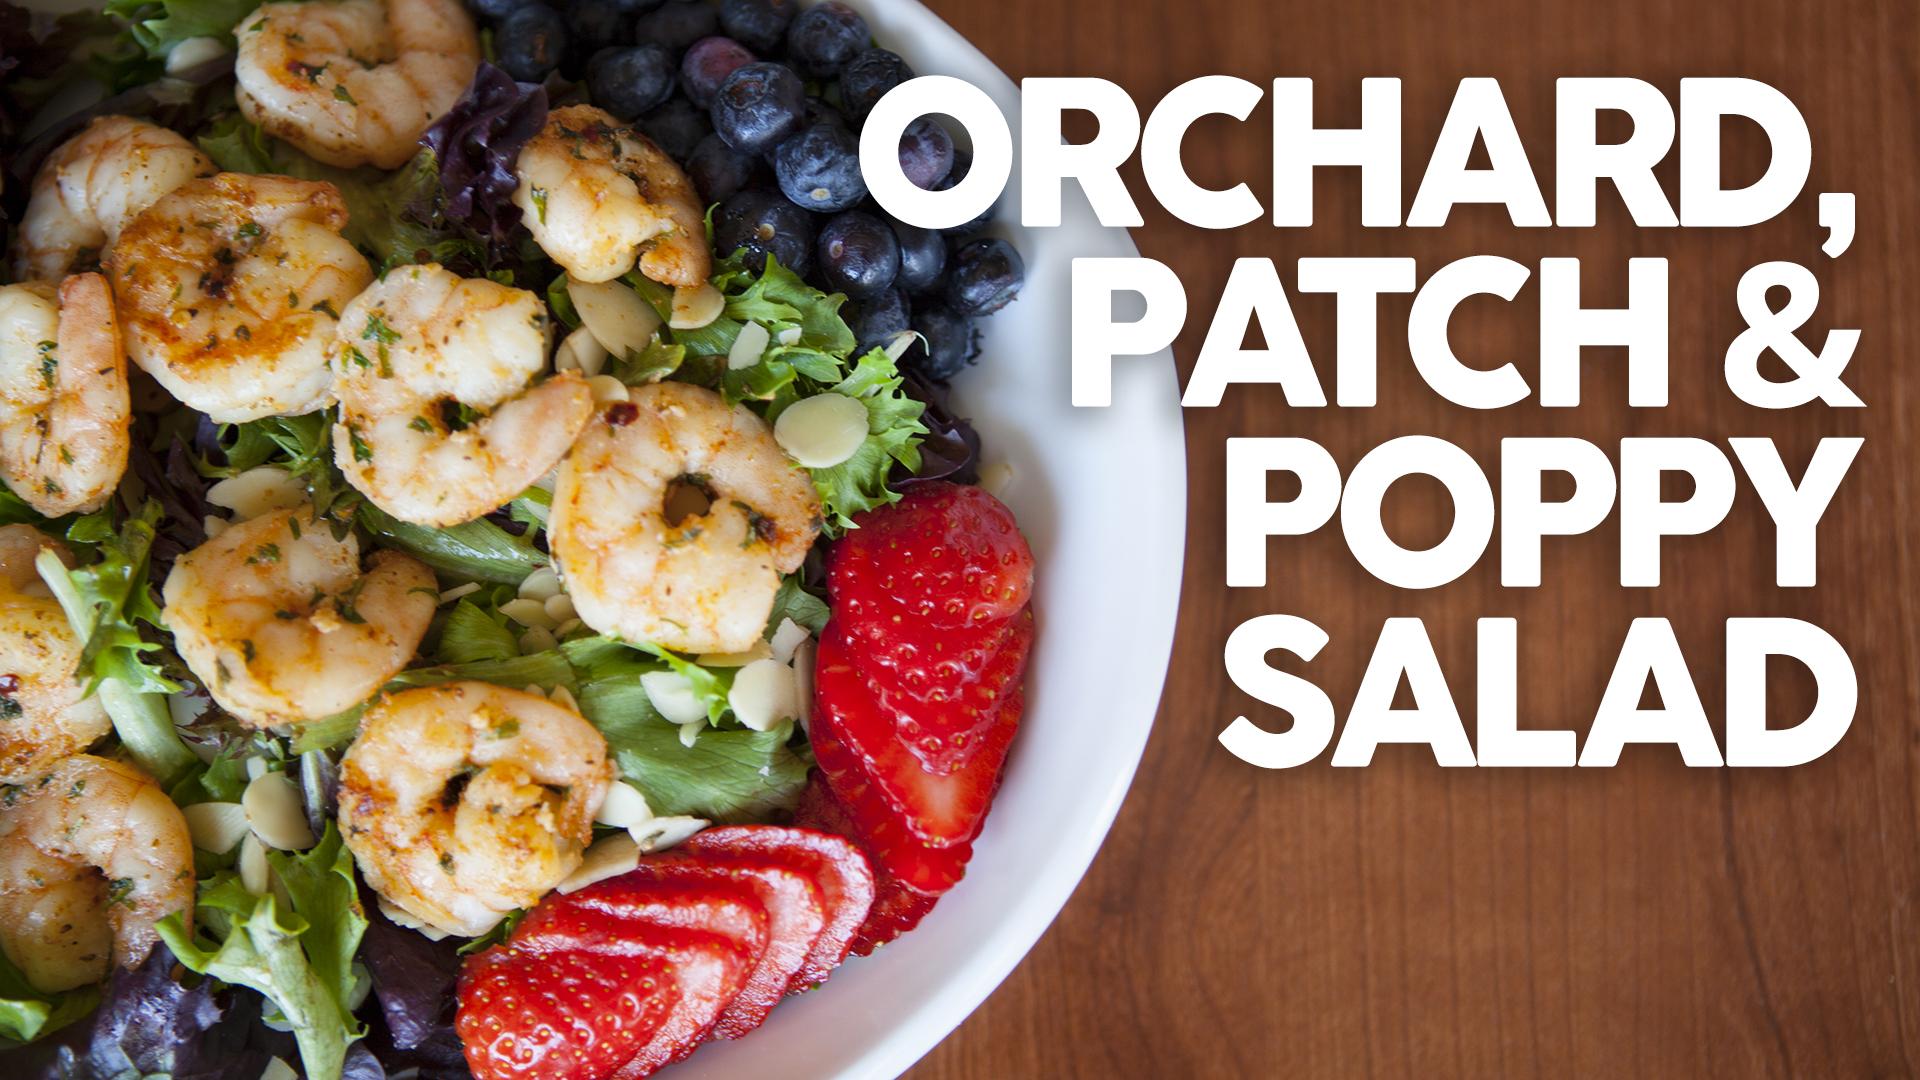 orchard-patch-poppy-salad